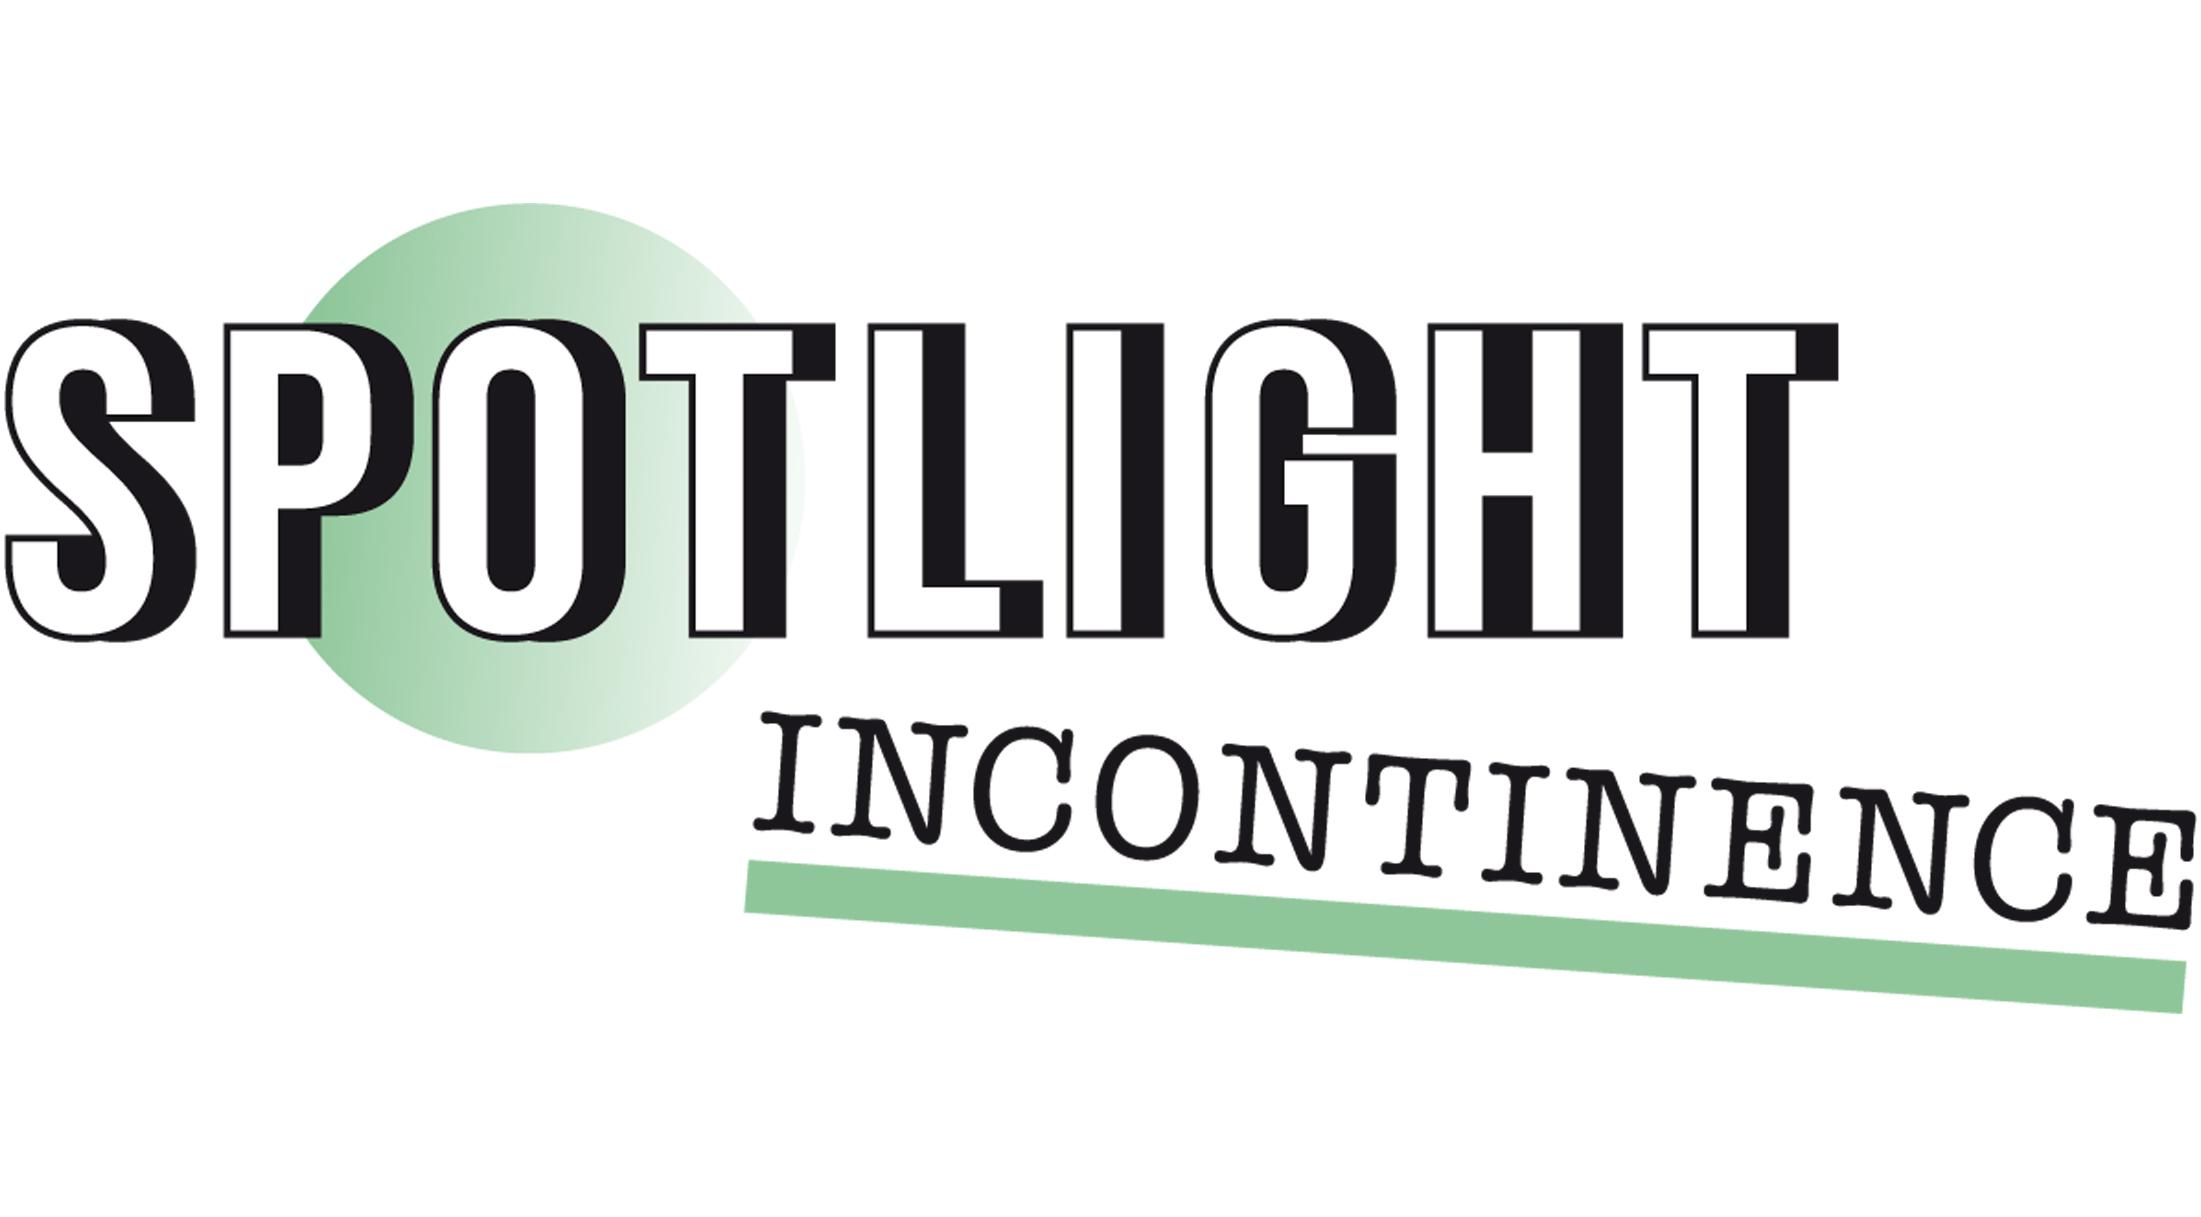 """Spotlight incontinence"" – voyager : préparation et organisation"